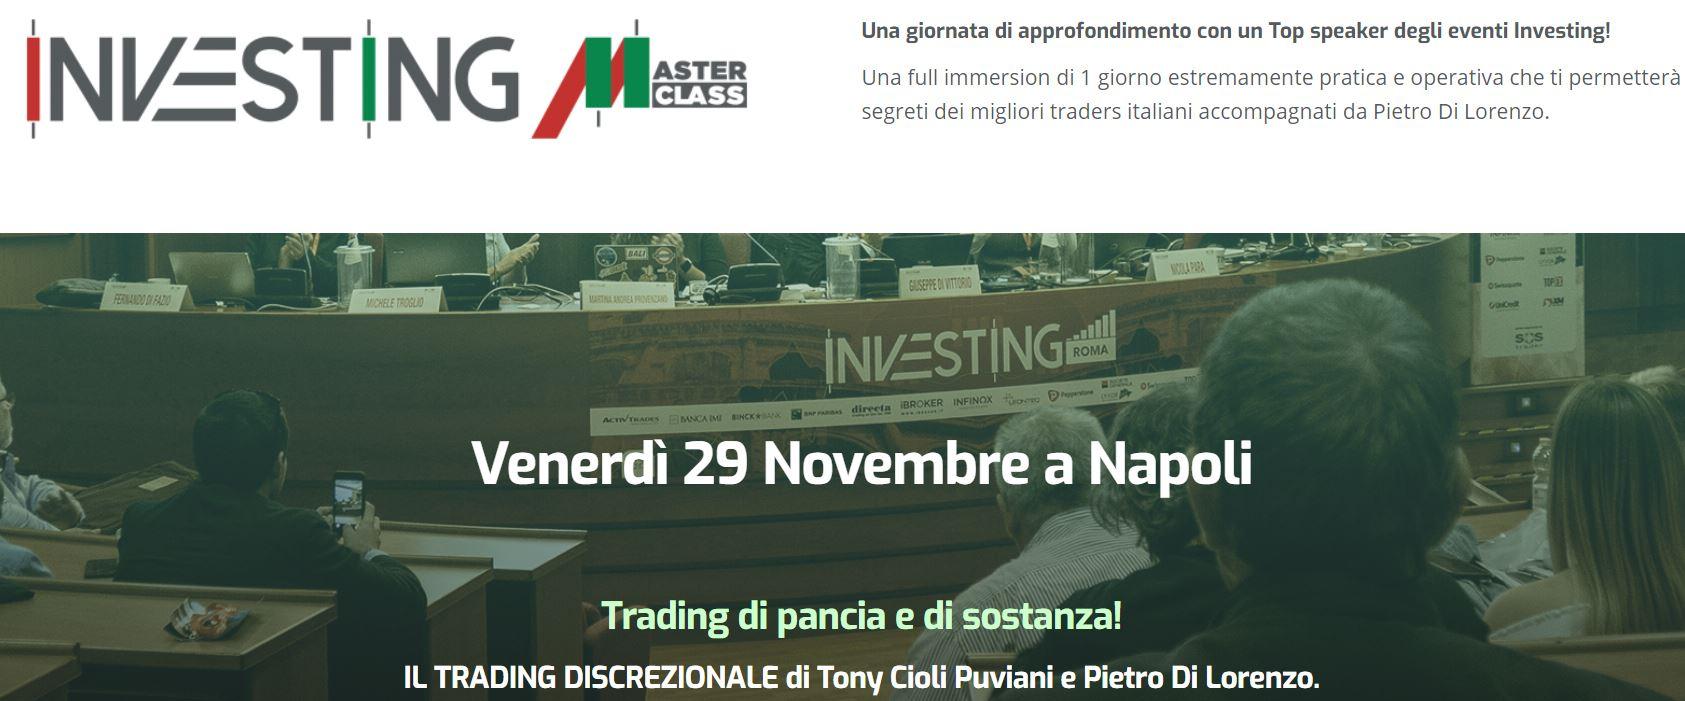 Investing Masterclass Napoli